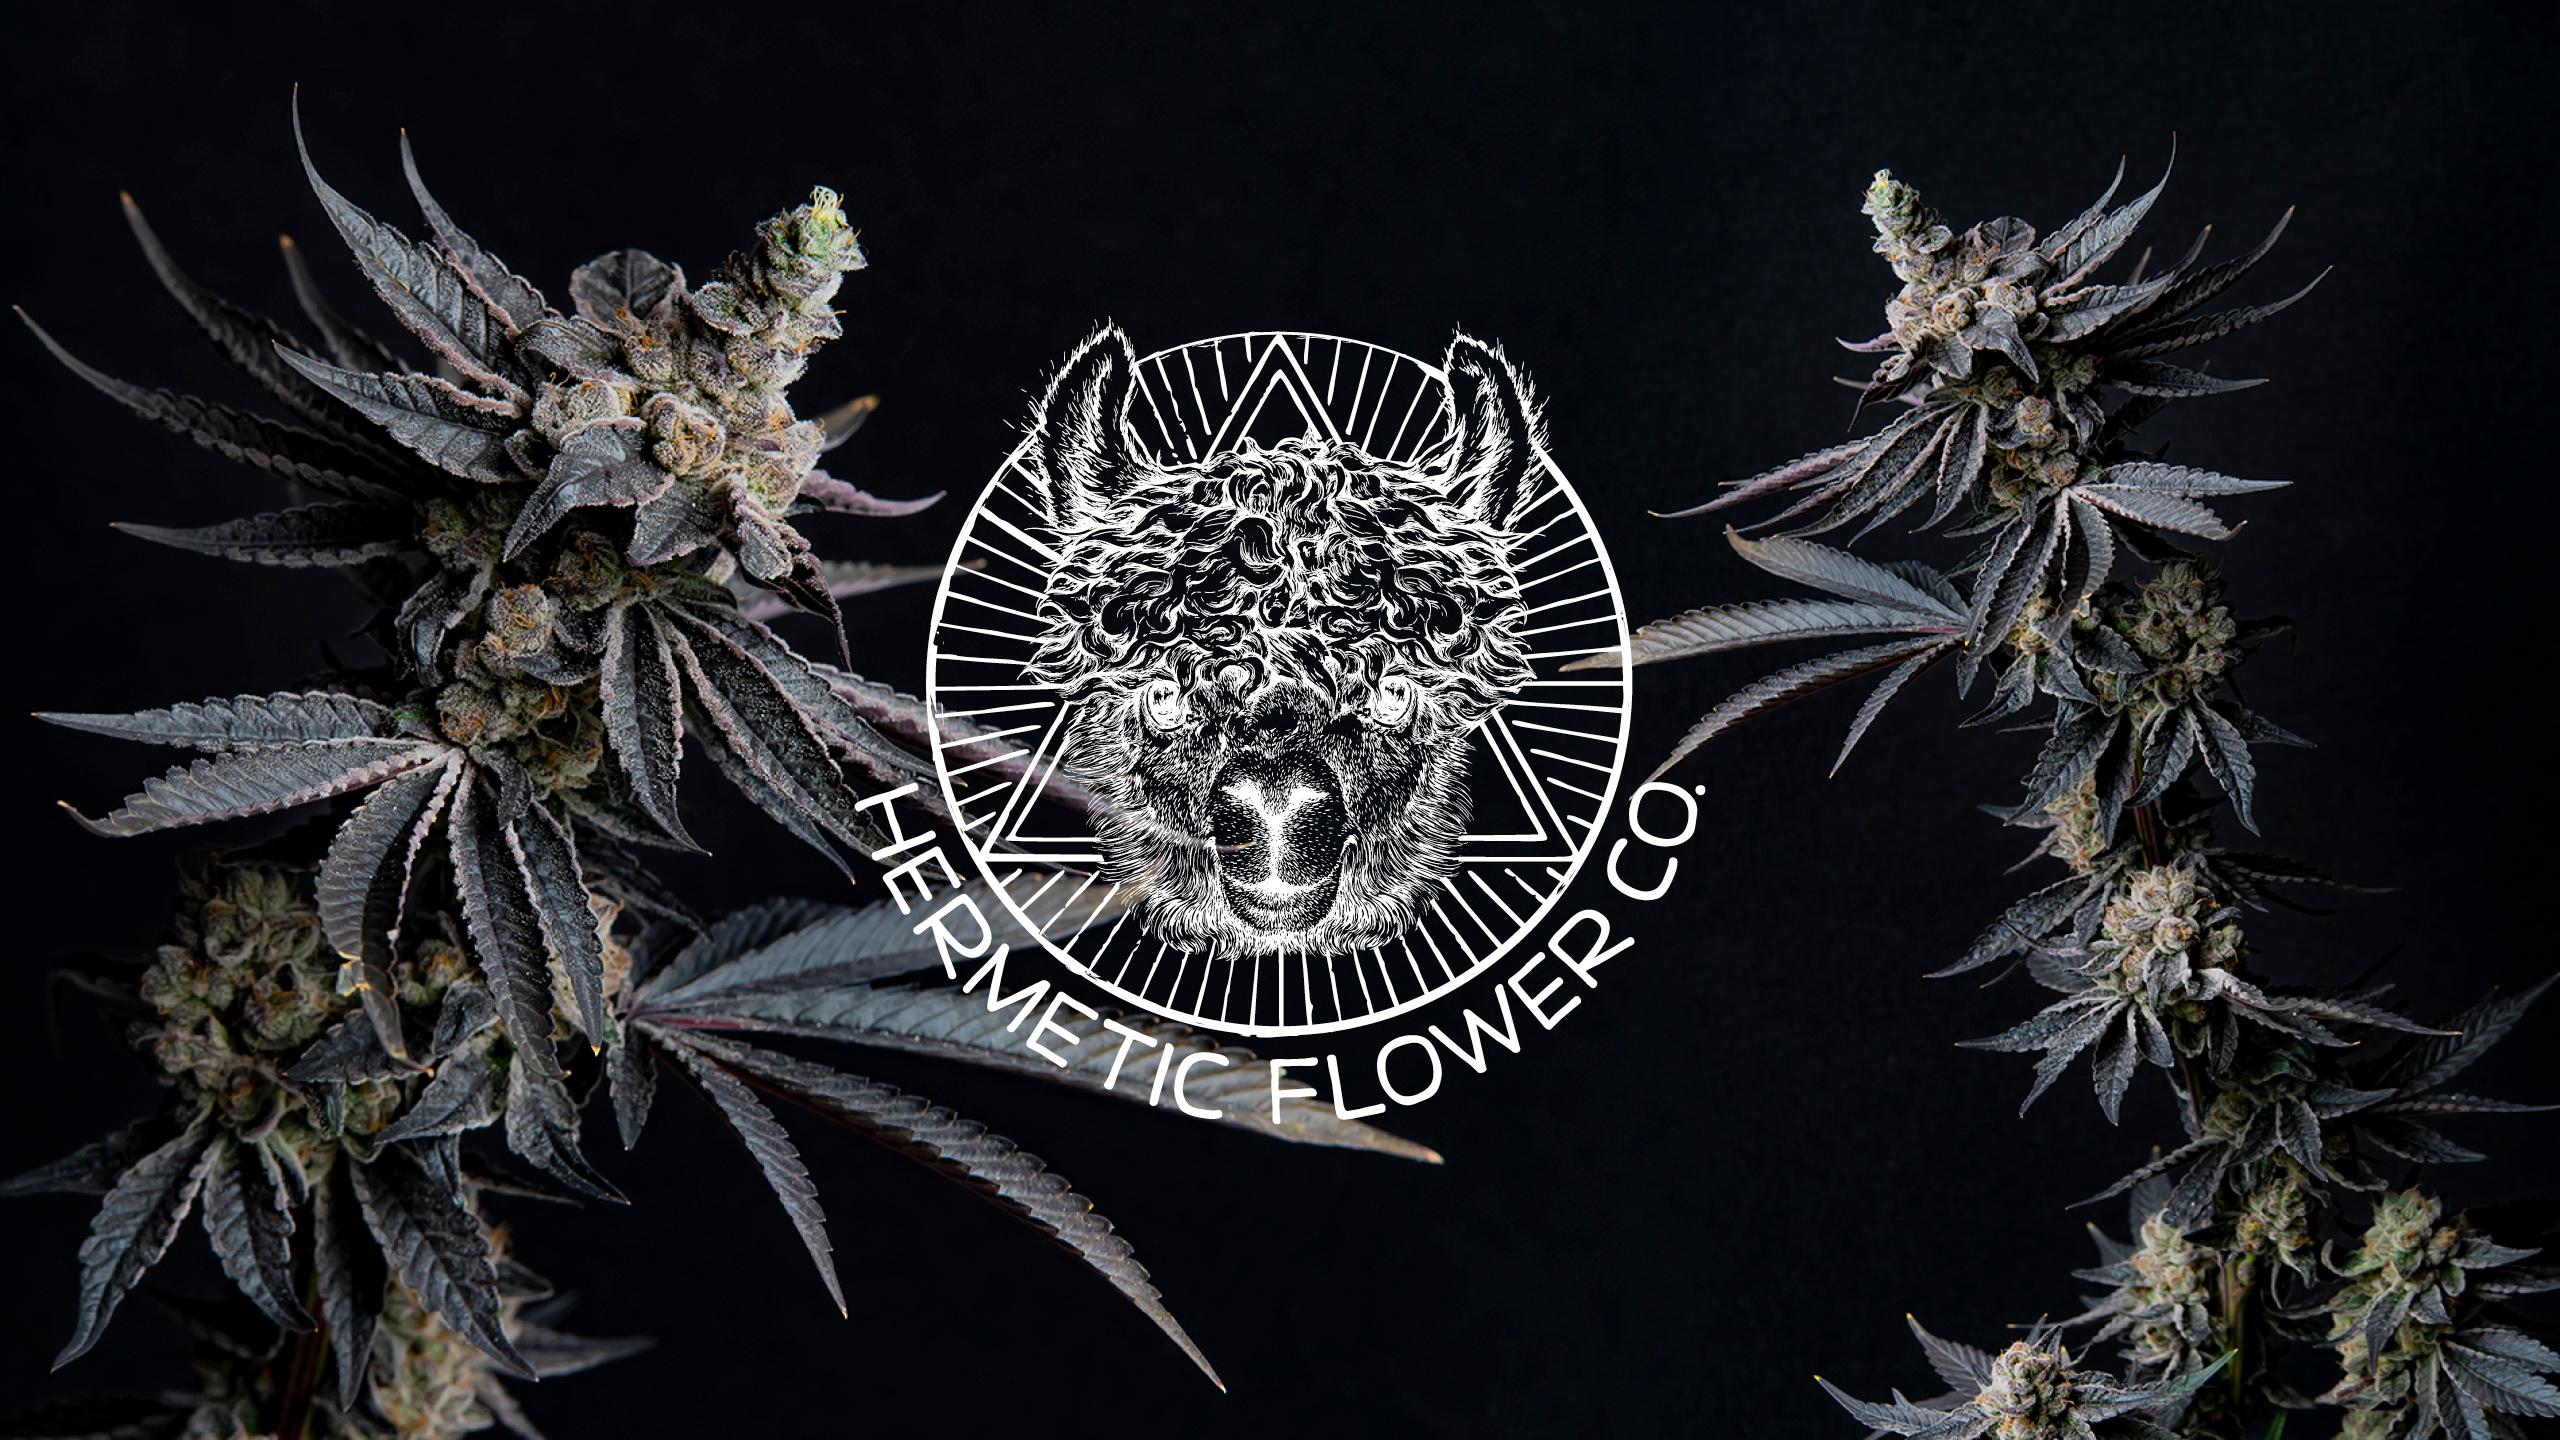 Hermetic Flower Company Brand Identity & Logo Creation by High Road Design Studio